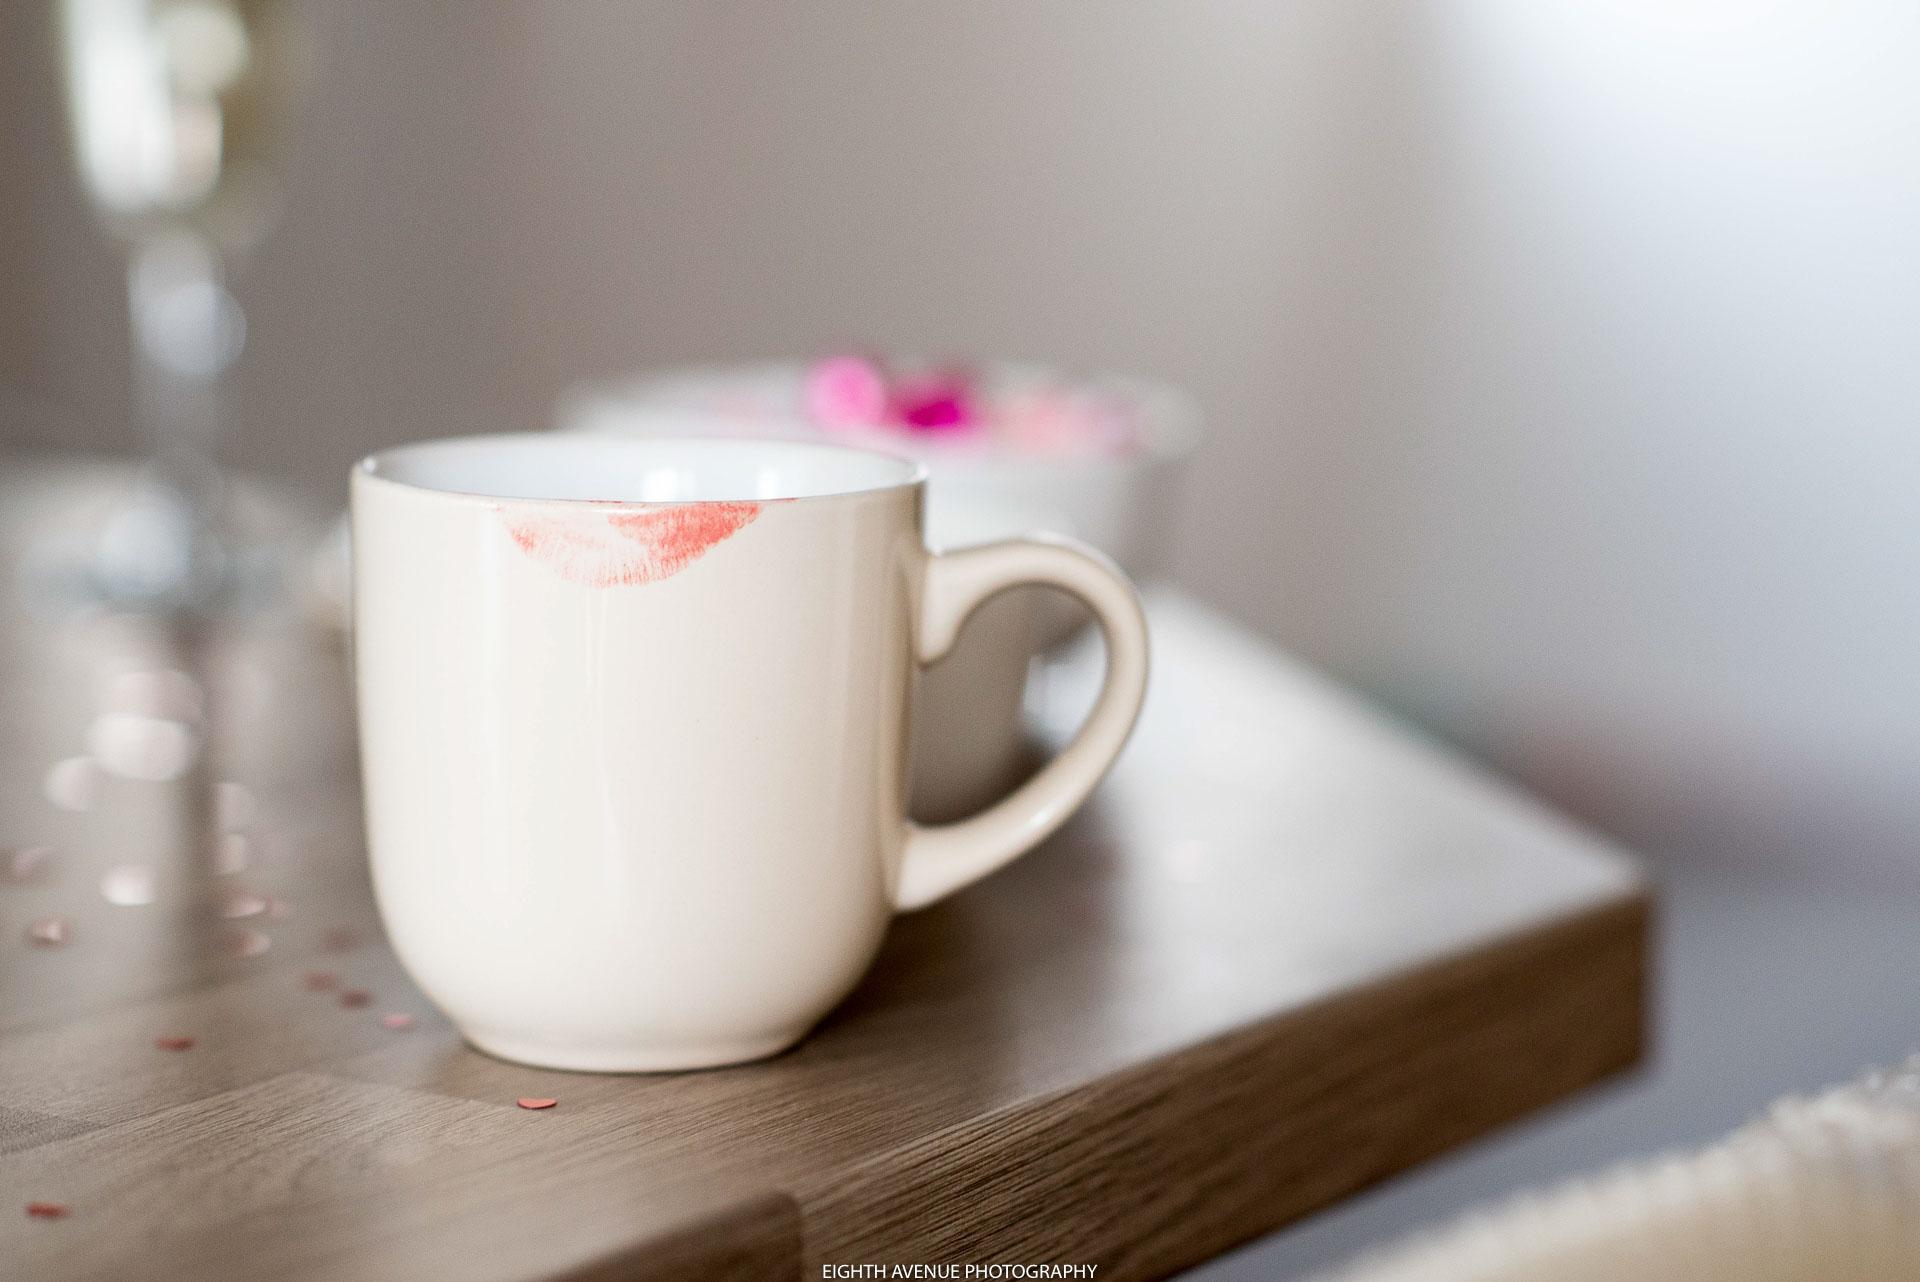 Bride's lipstick mark on cup